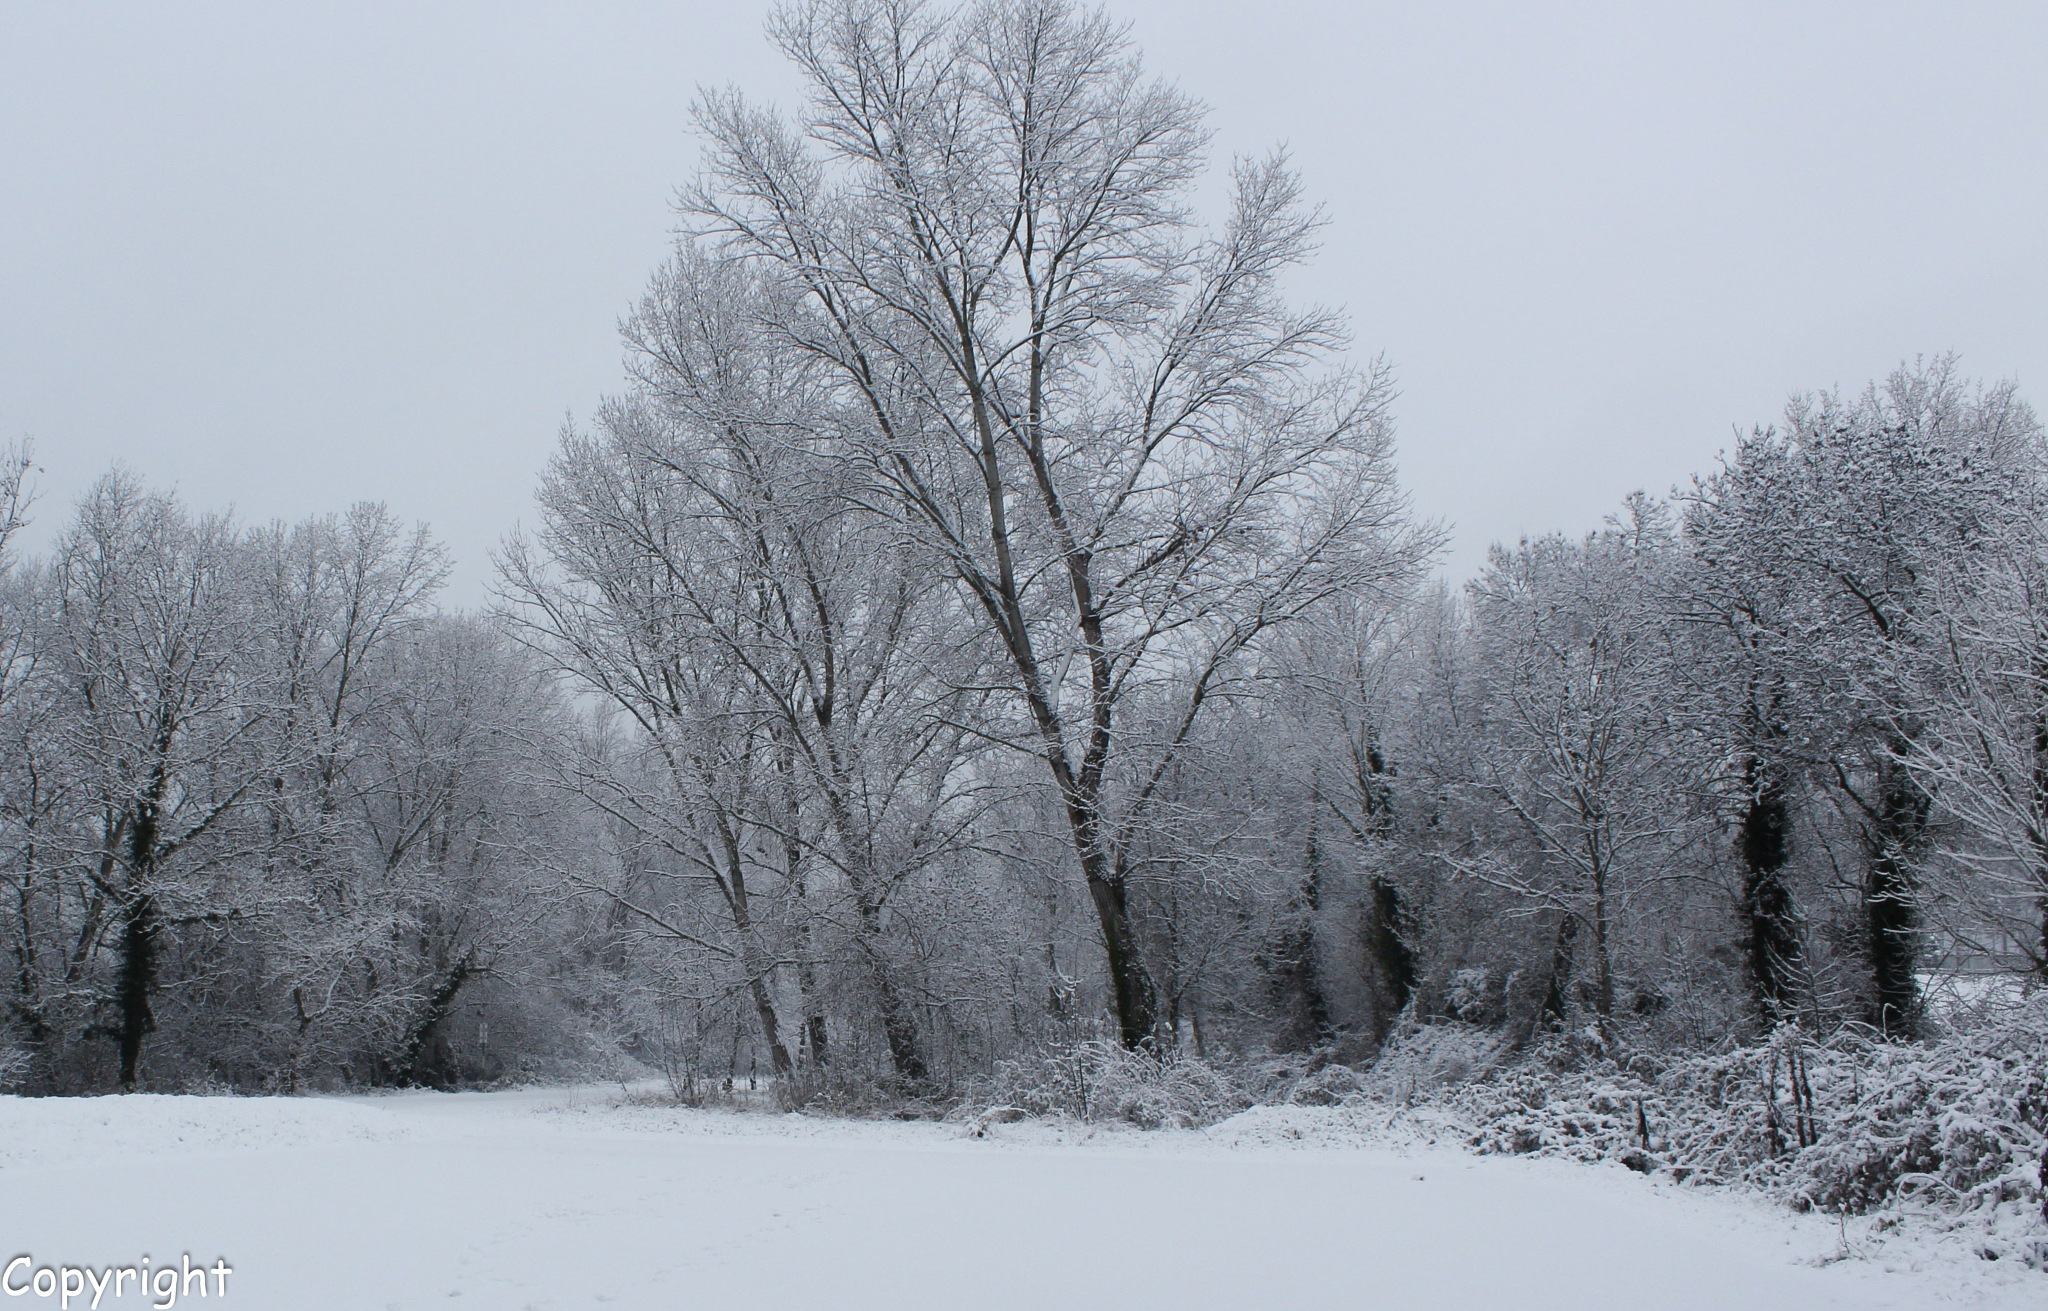 L'hiver est là ! Winter is coming ! by Claudine MACHONPEREIRA